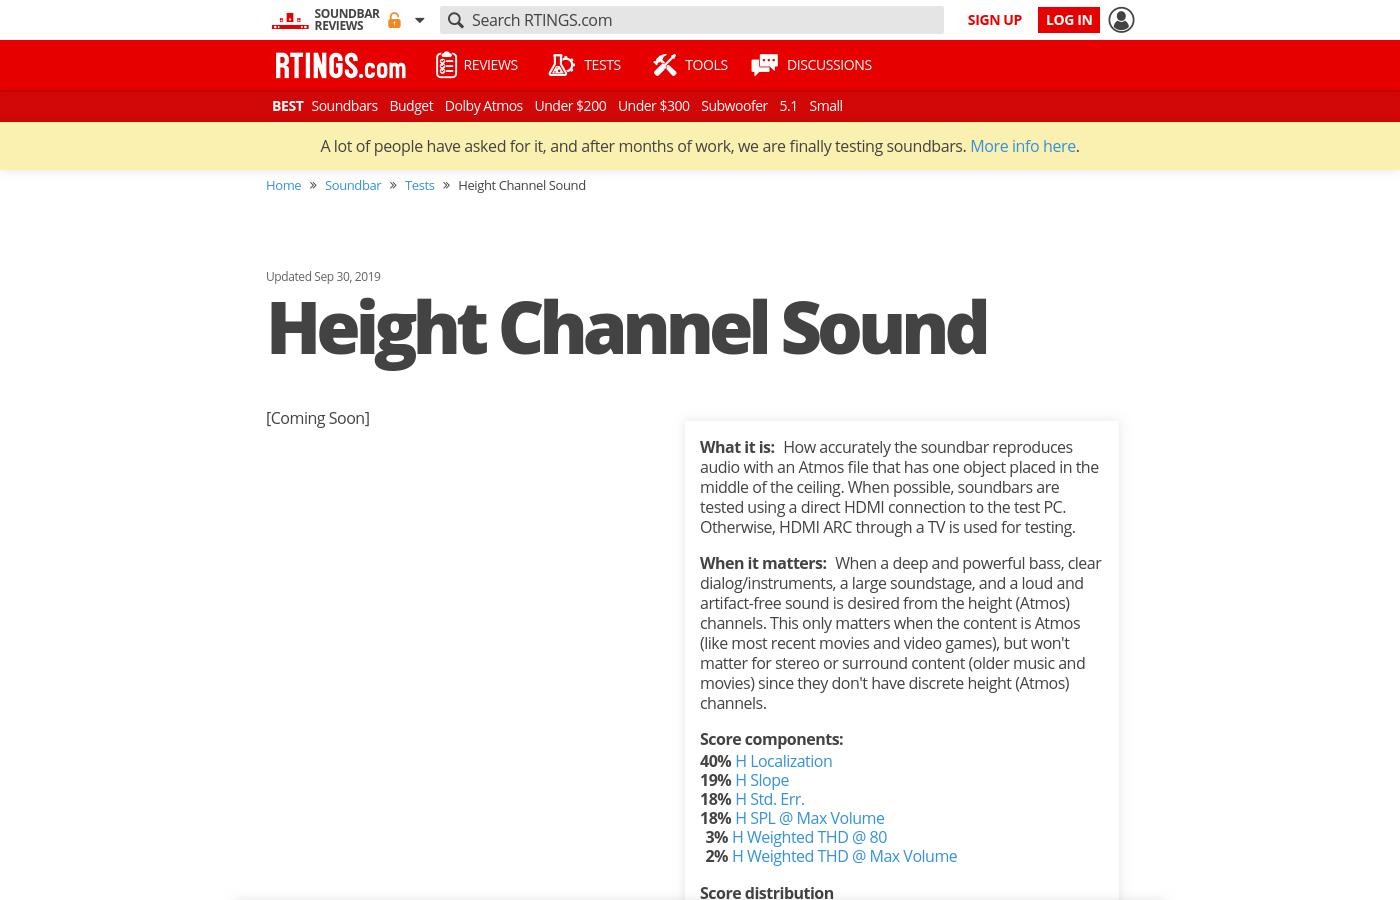 Height Channel Sound